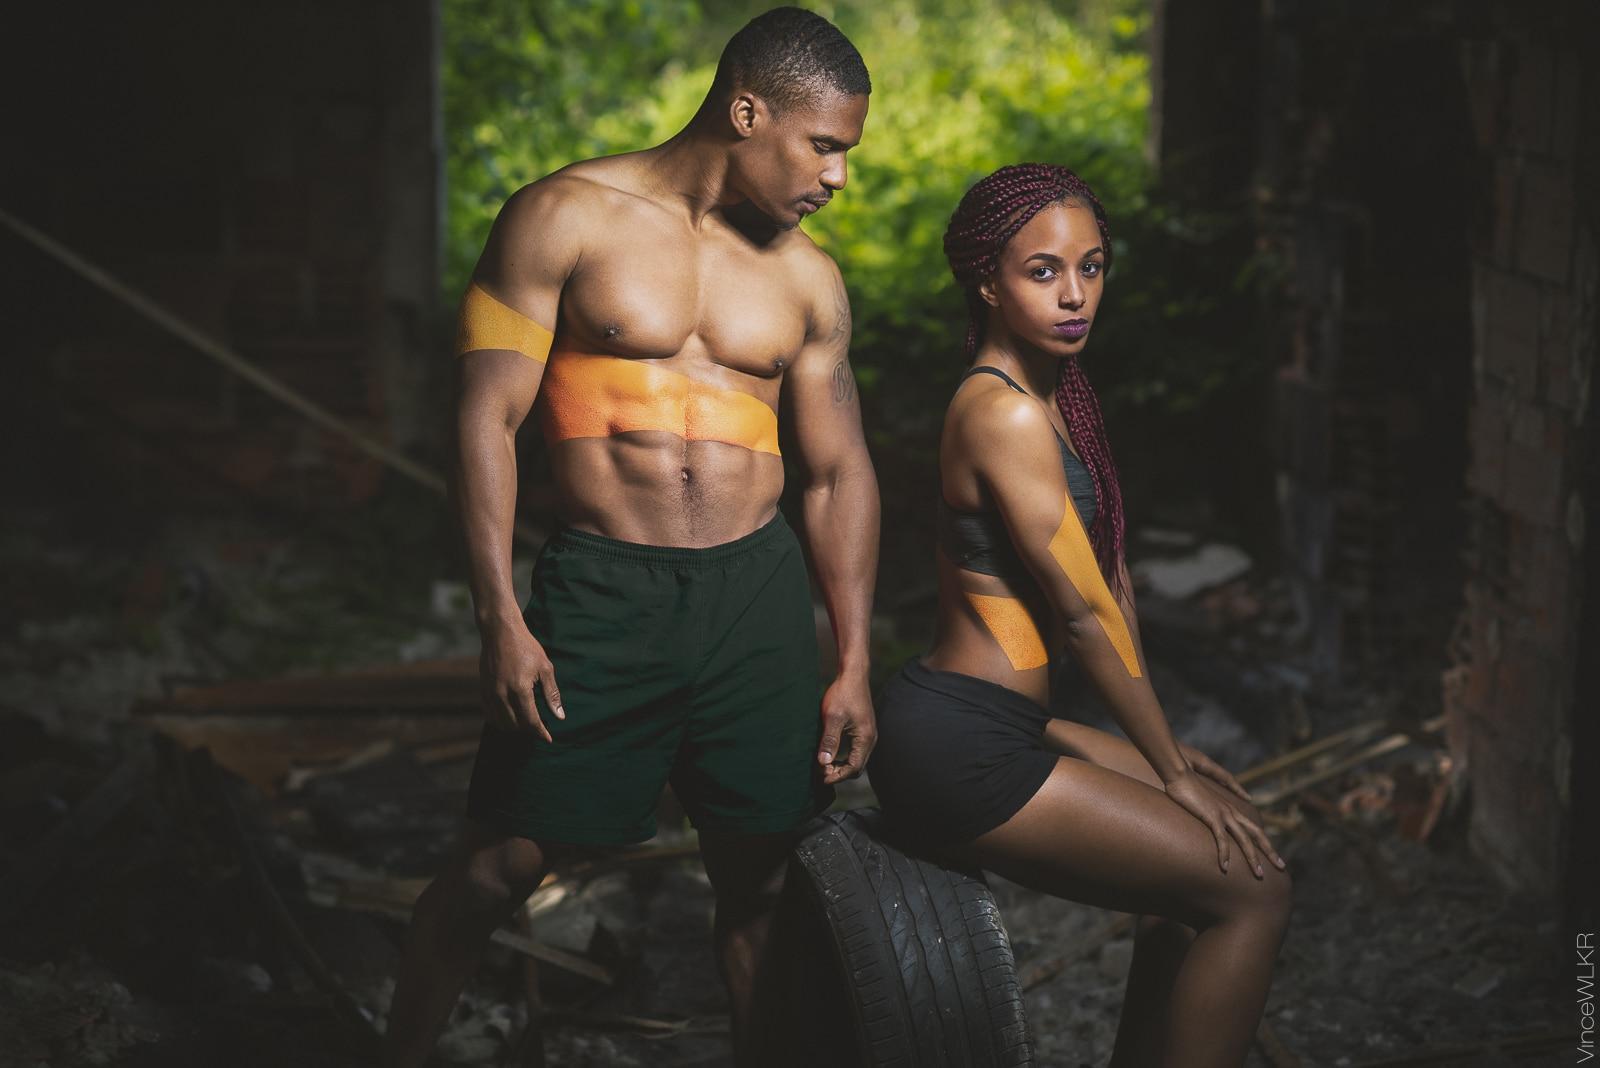 bodypainting athletes urbain